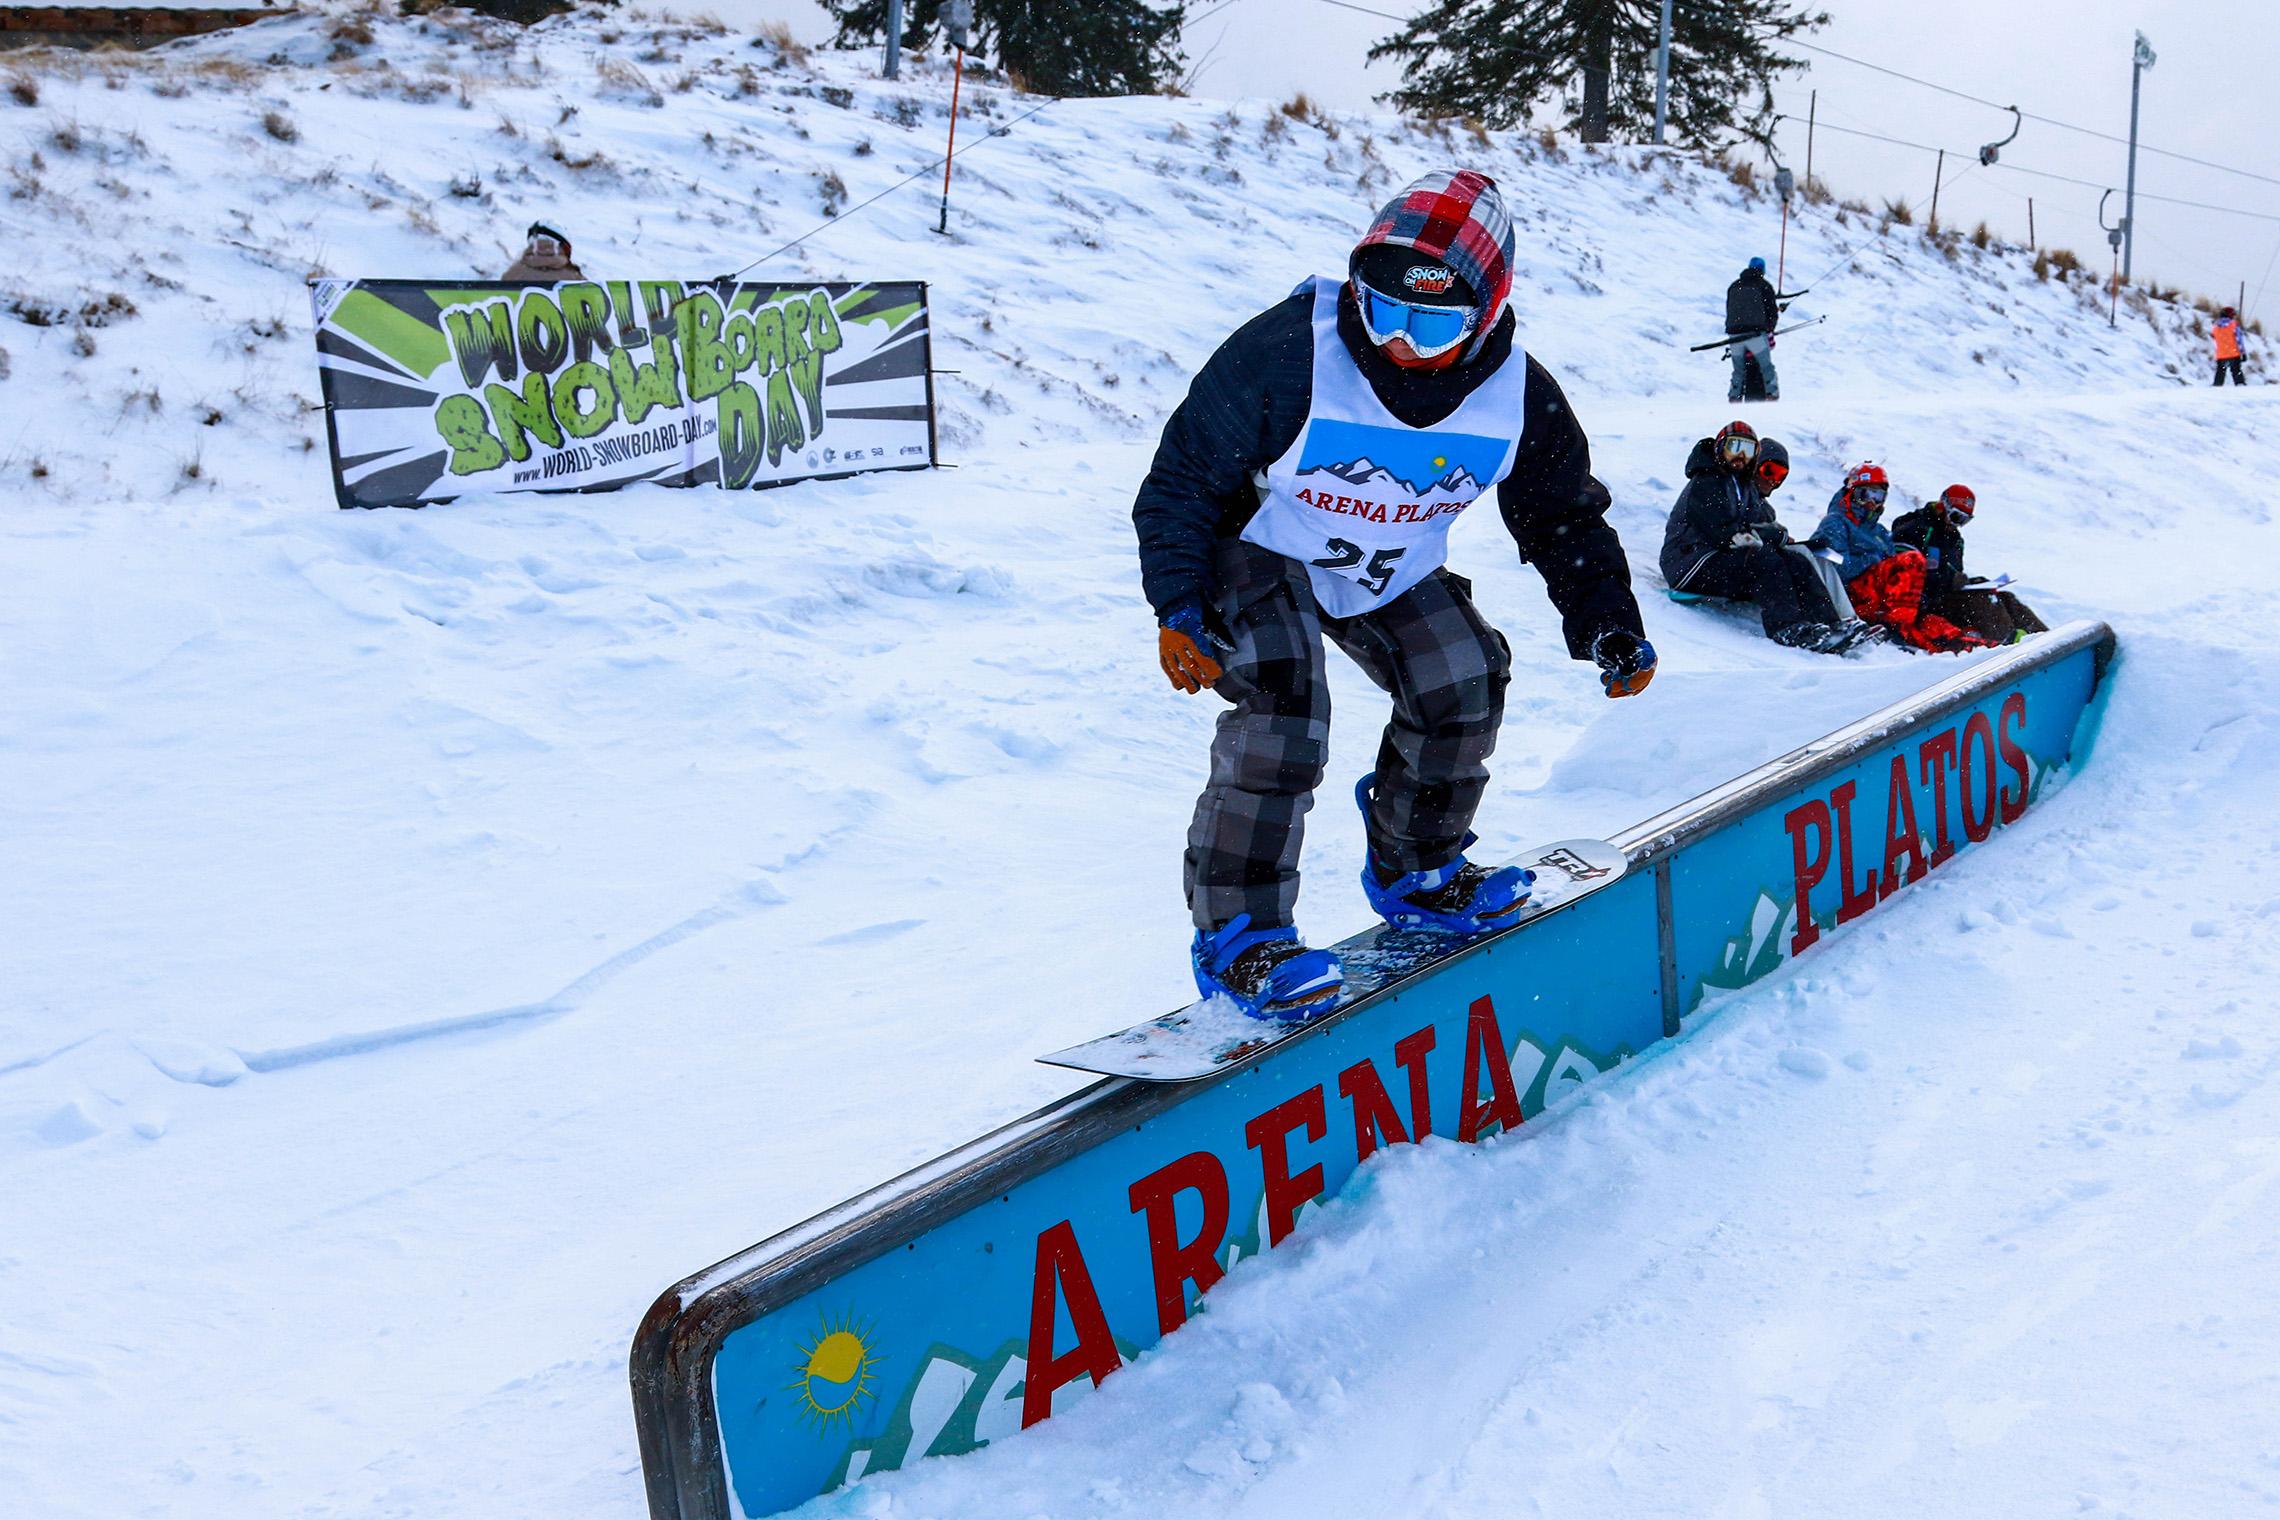 World Snowboard Day la Arena Platos